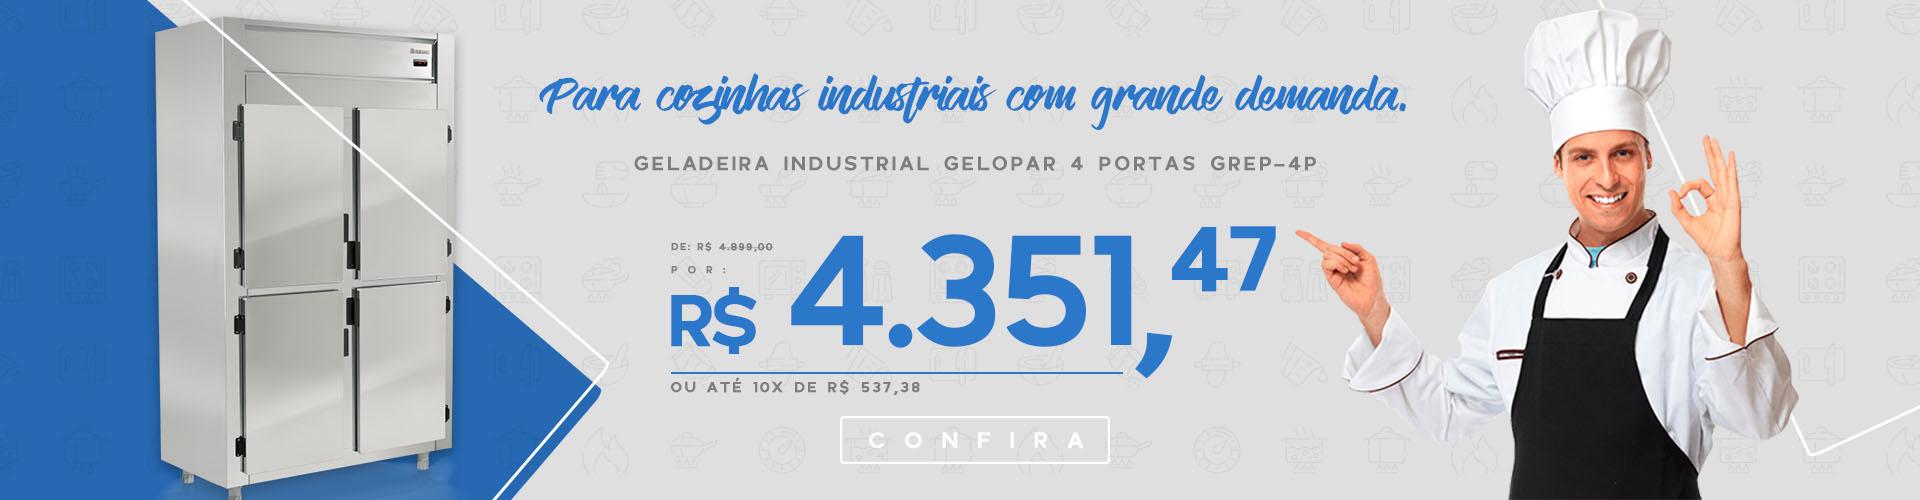 Geladeira Industrial GREP-4P